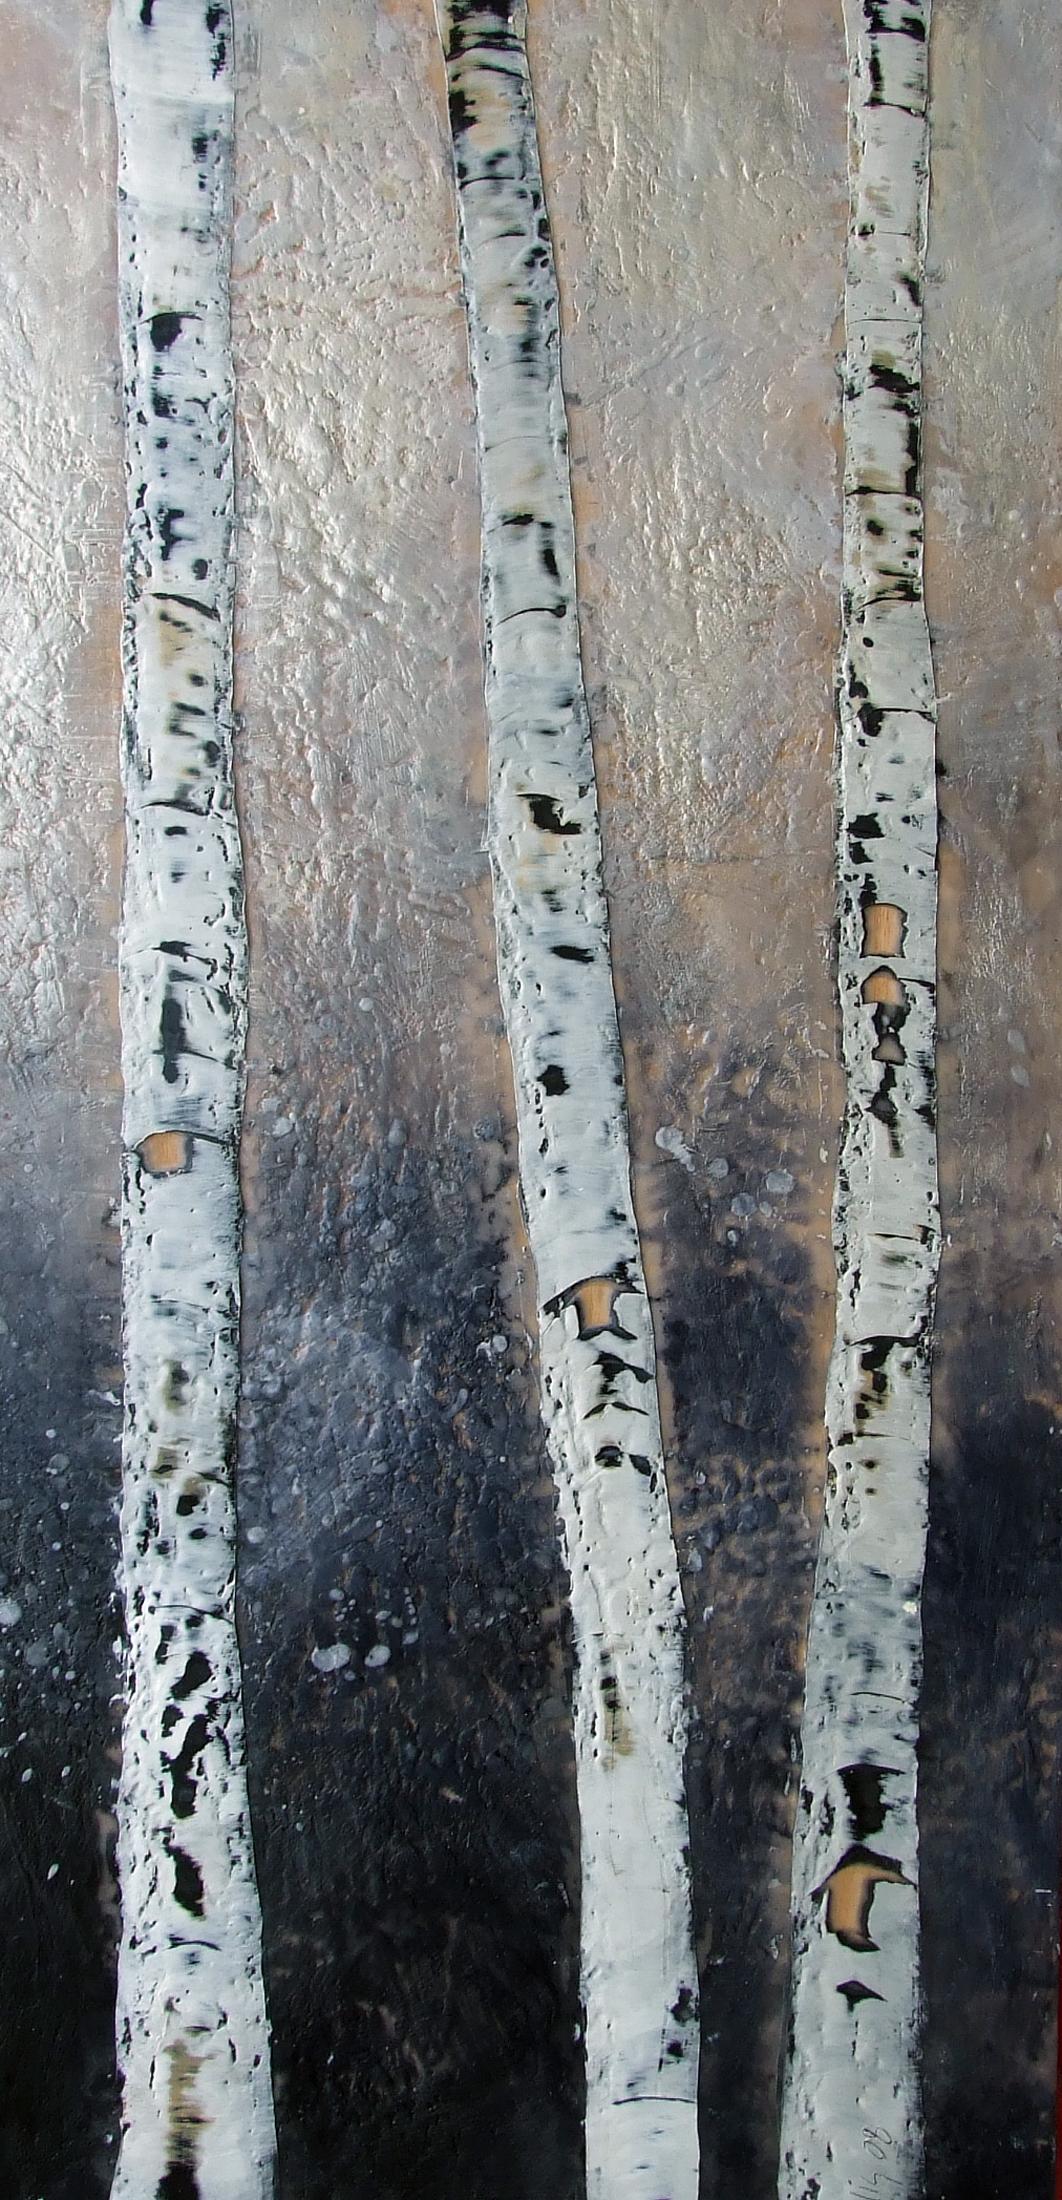 Moonlight 24x48 triptych 2008 #3.jpg